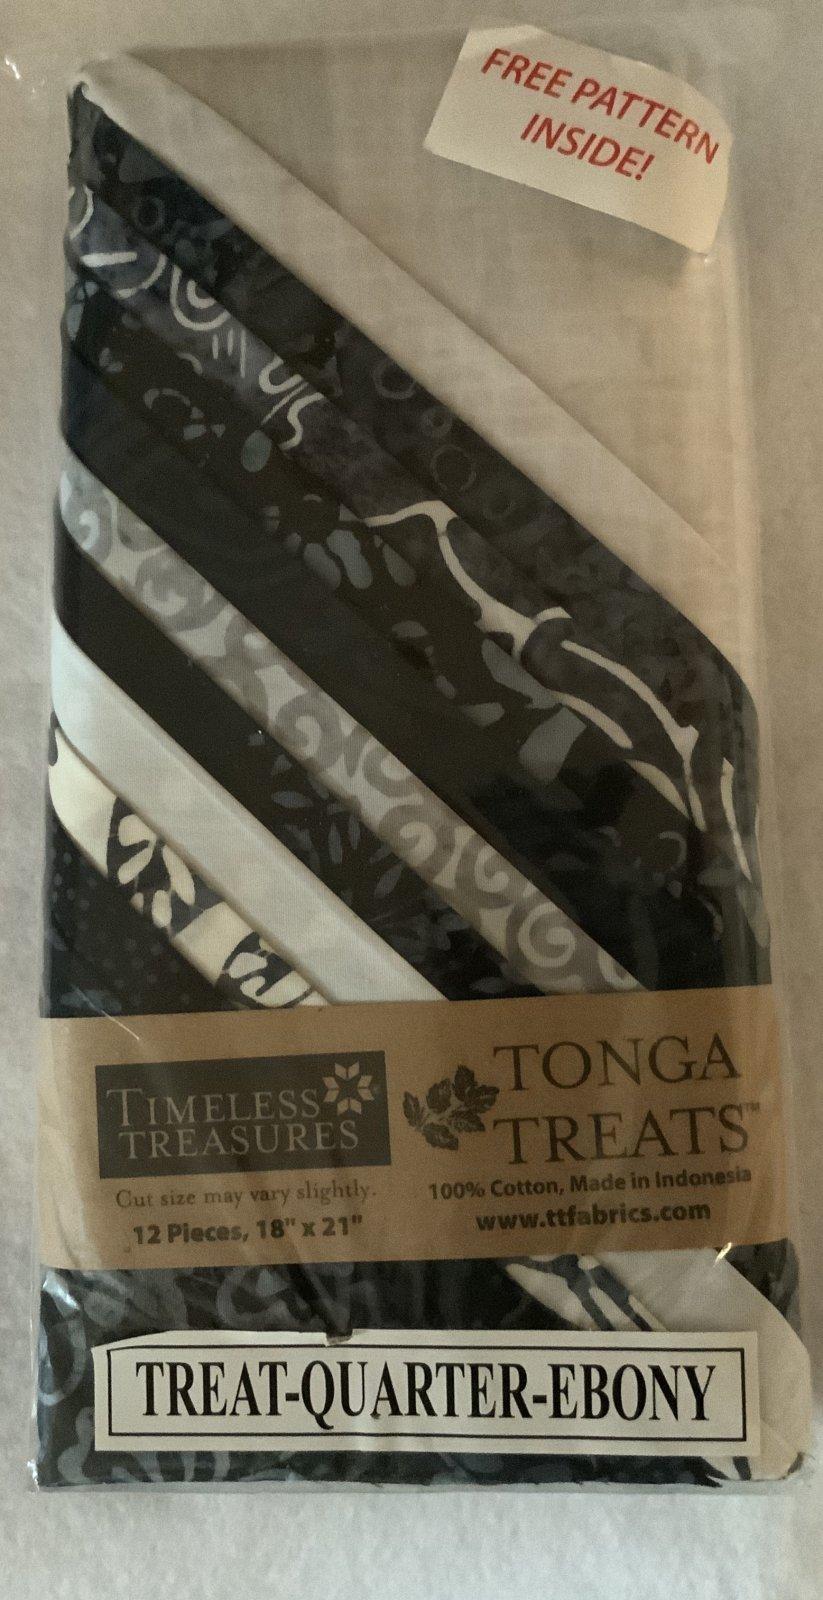 Tonga Treat Fat Quarters Ebony (18in x 21in) 12pcs - Timeless Treasures